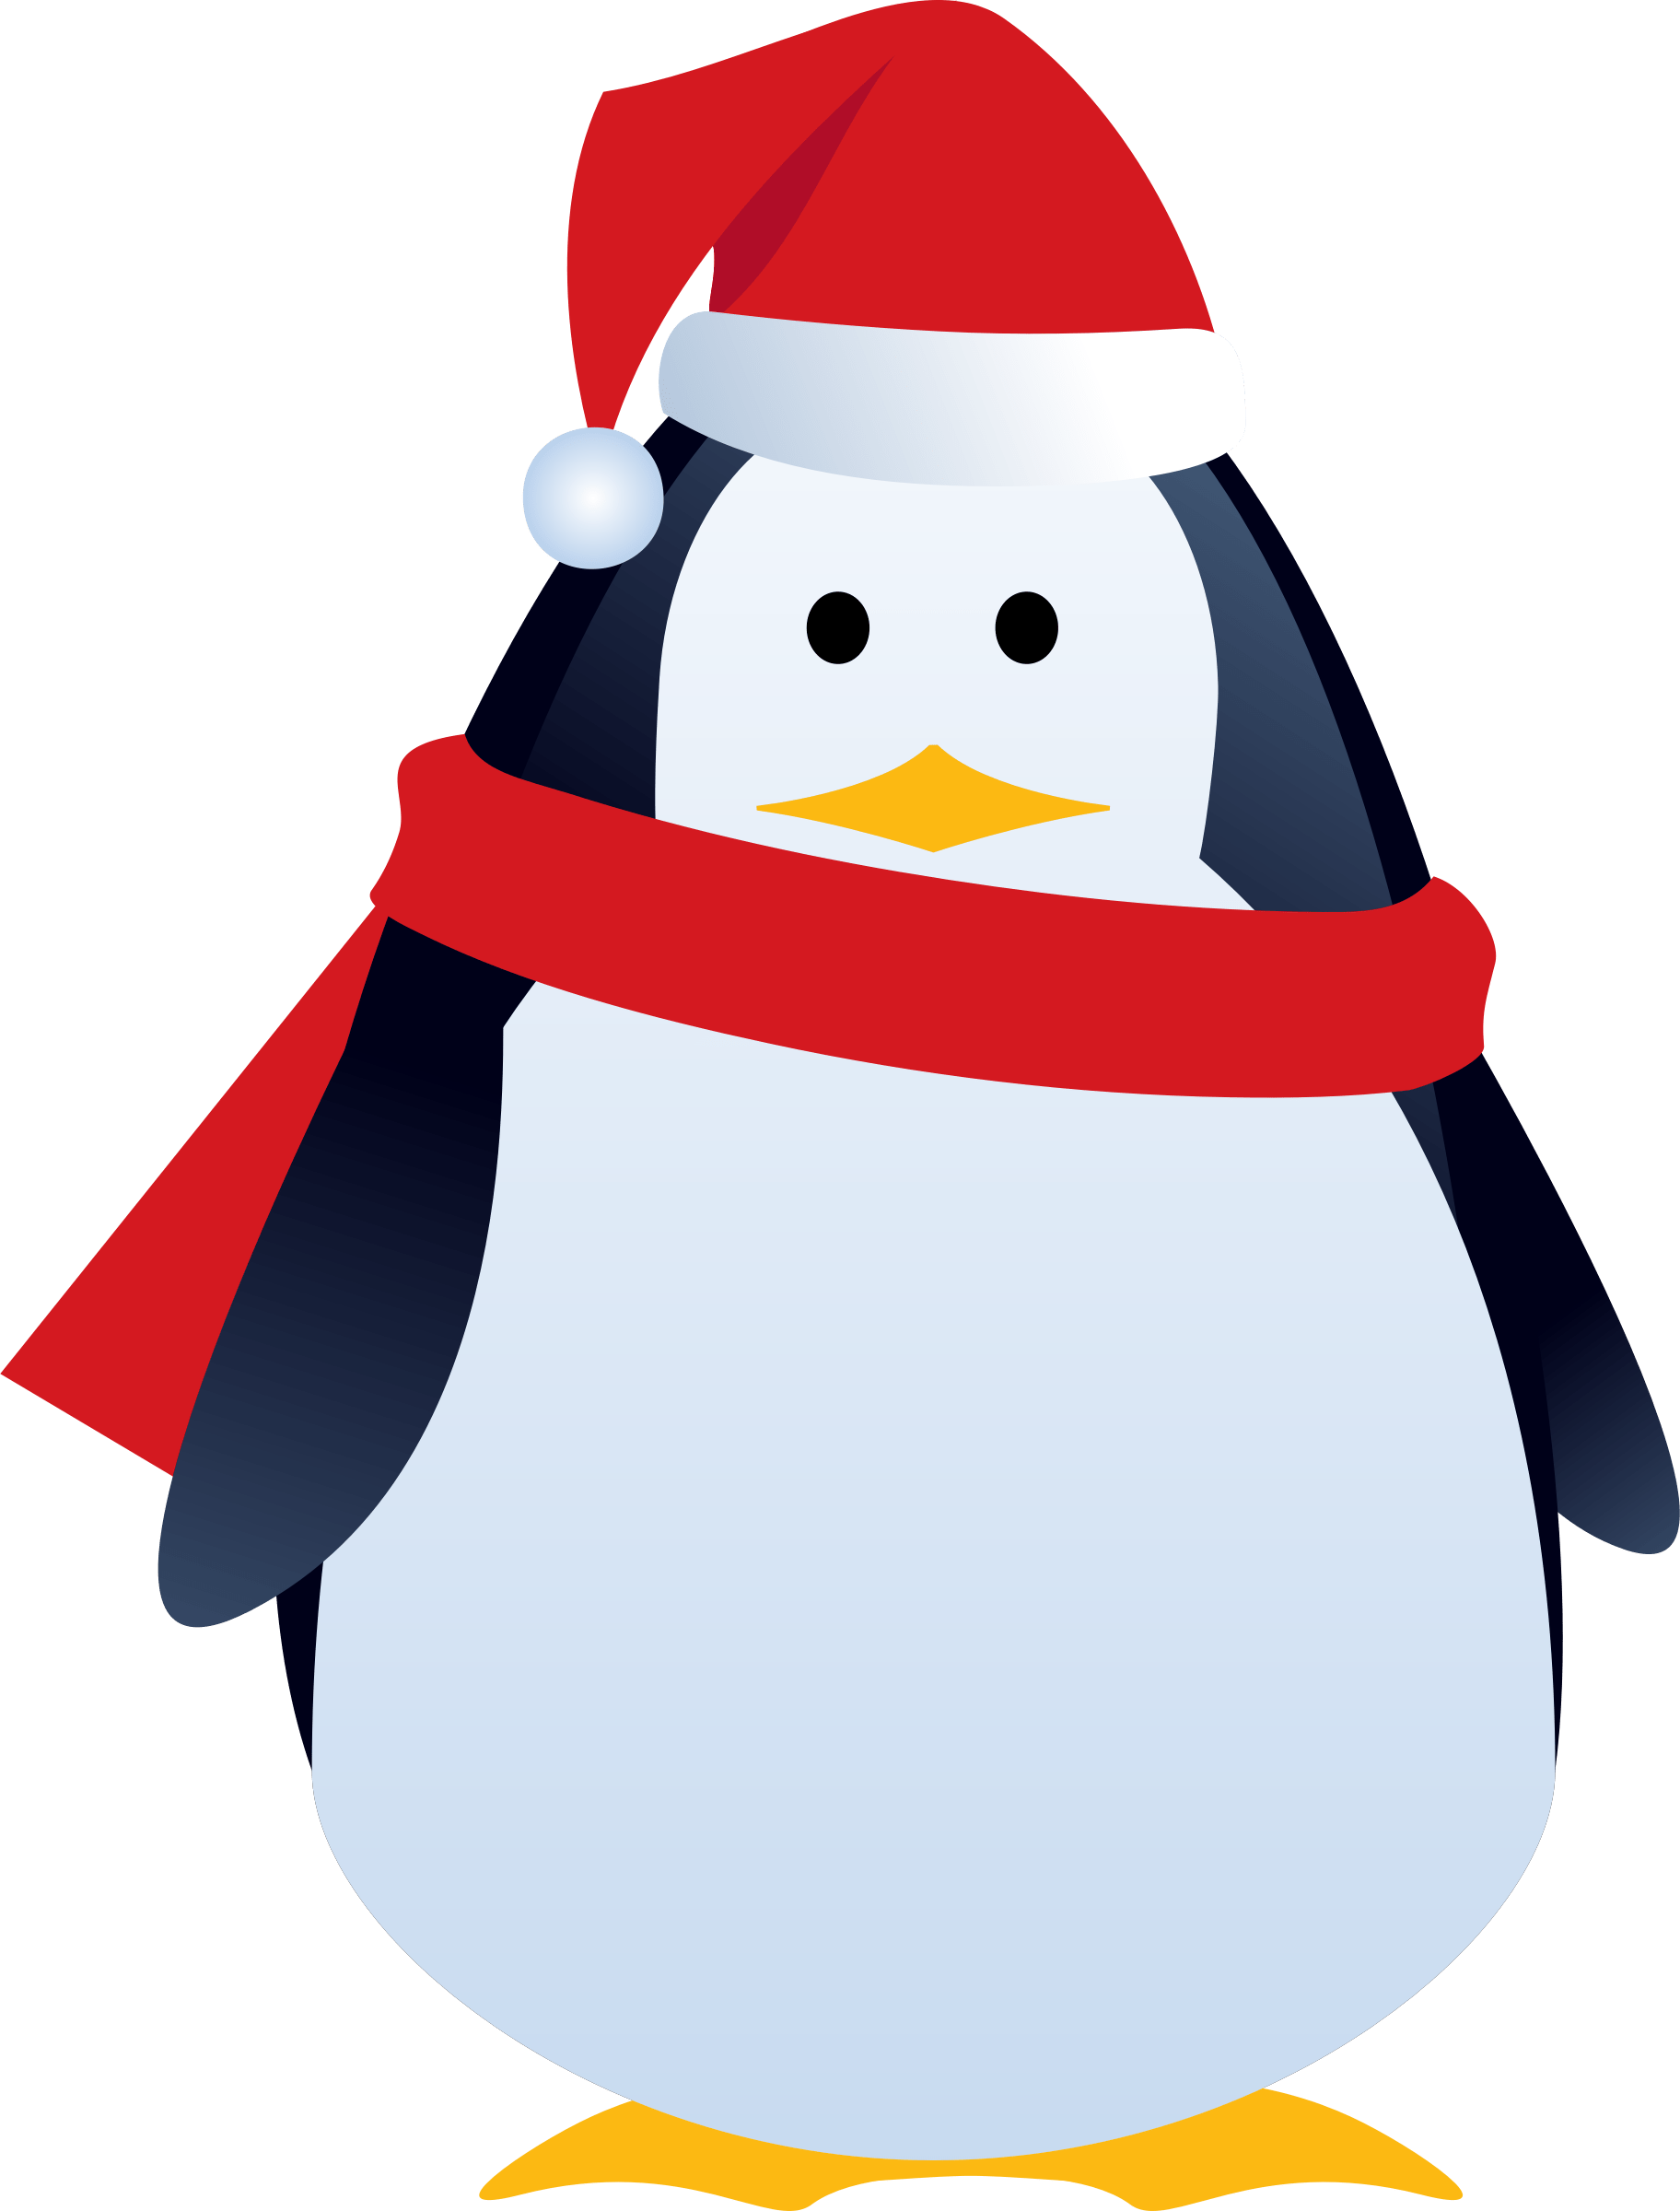 Nativity clipart character. Jingle bells cartoon transparent